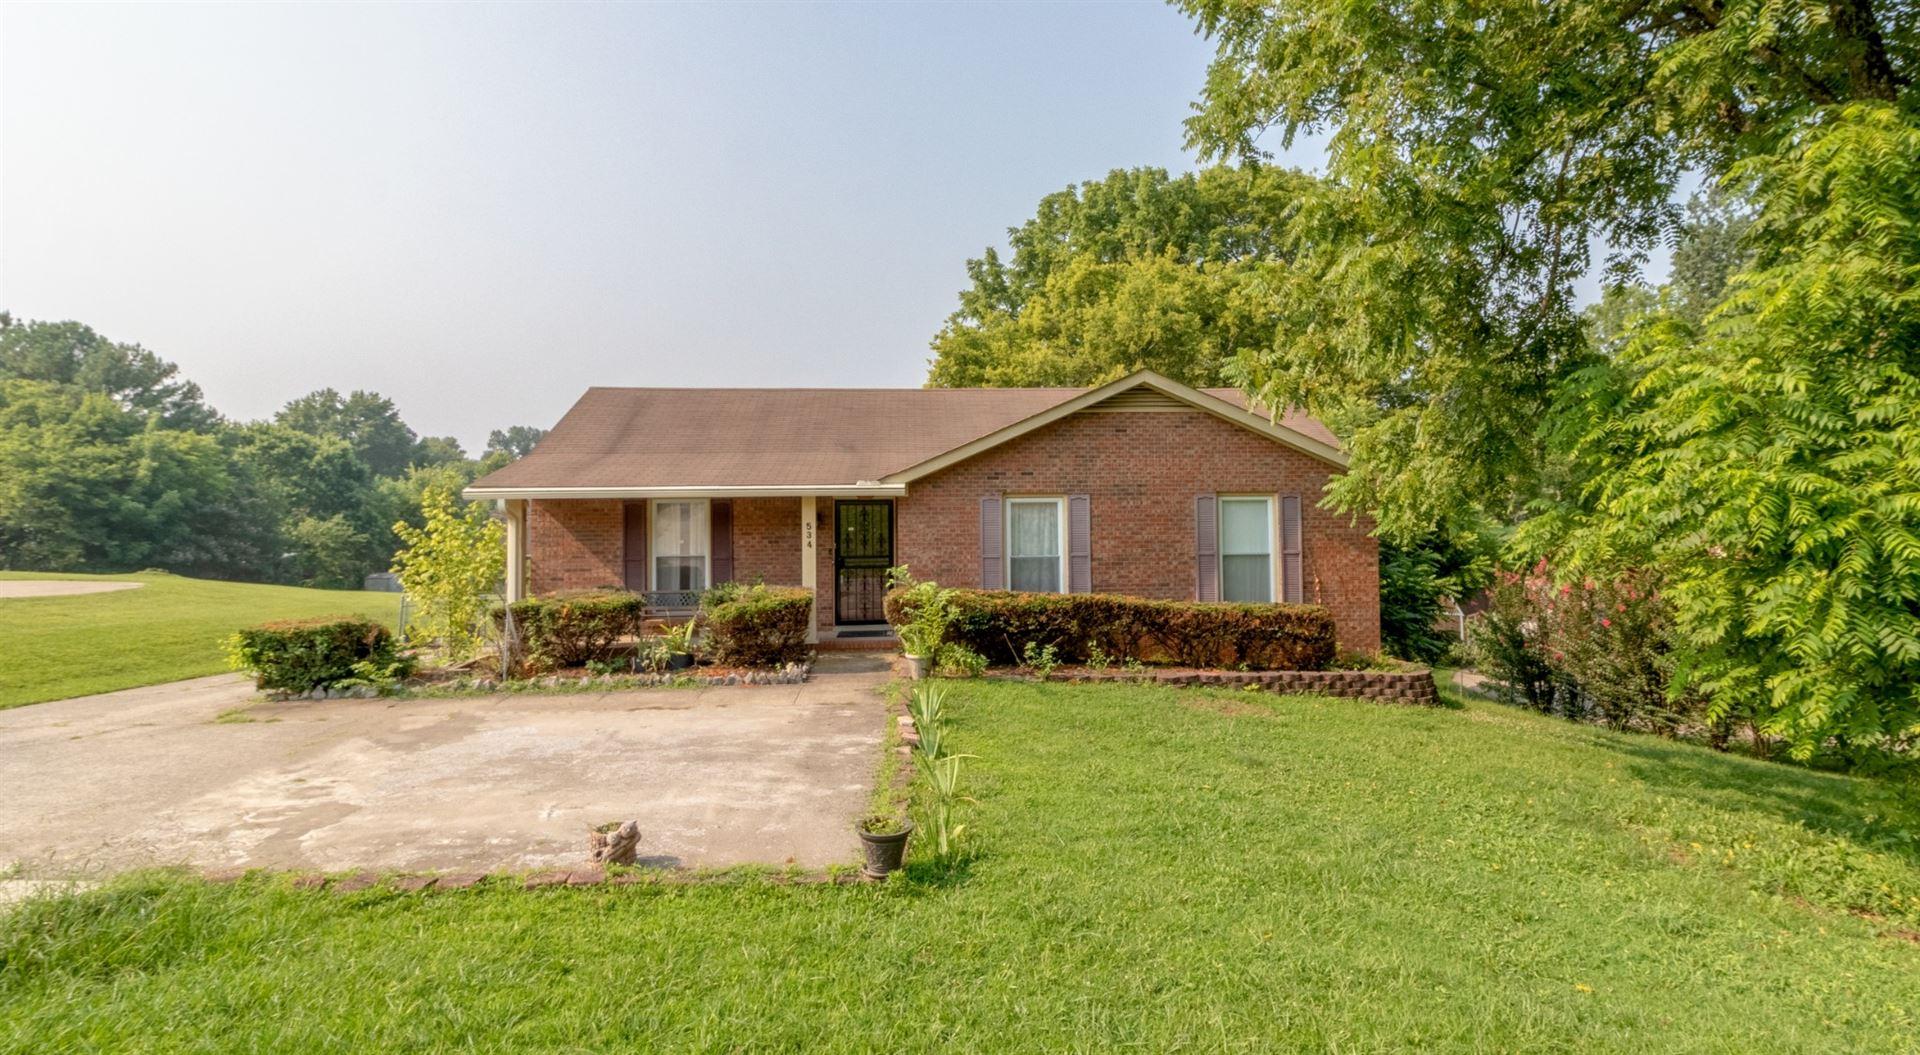 534 Pollard Rd, Clarksville, TN 37042 - MLS#: 2275378